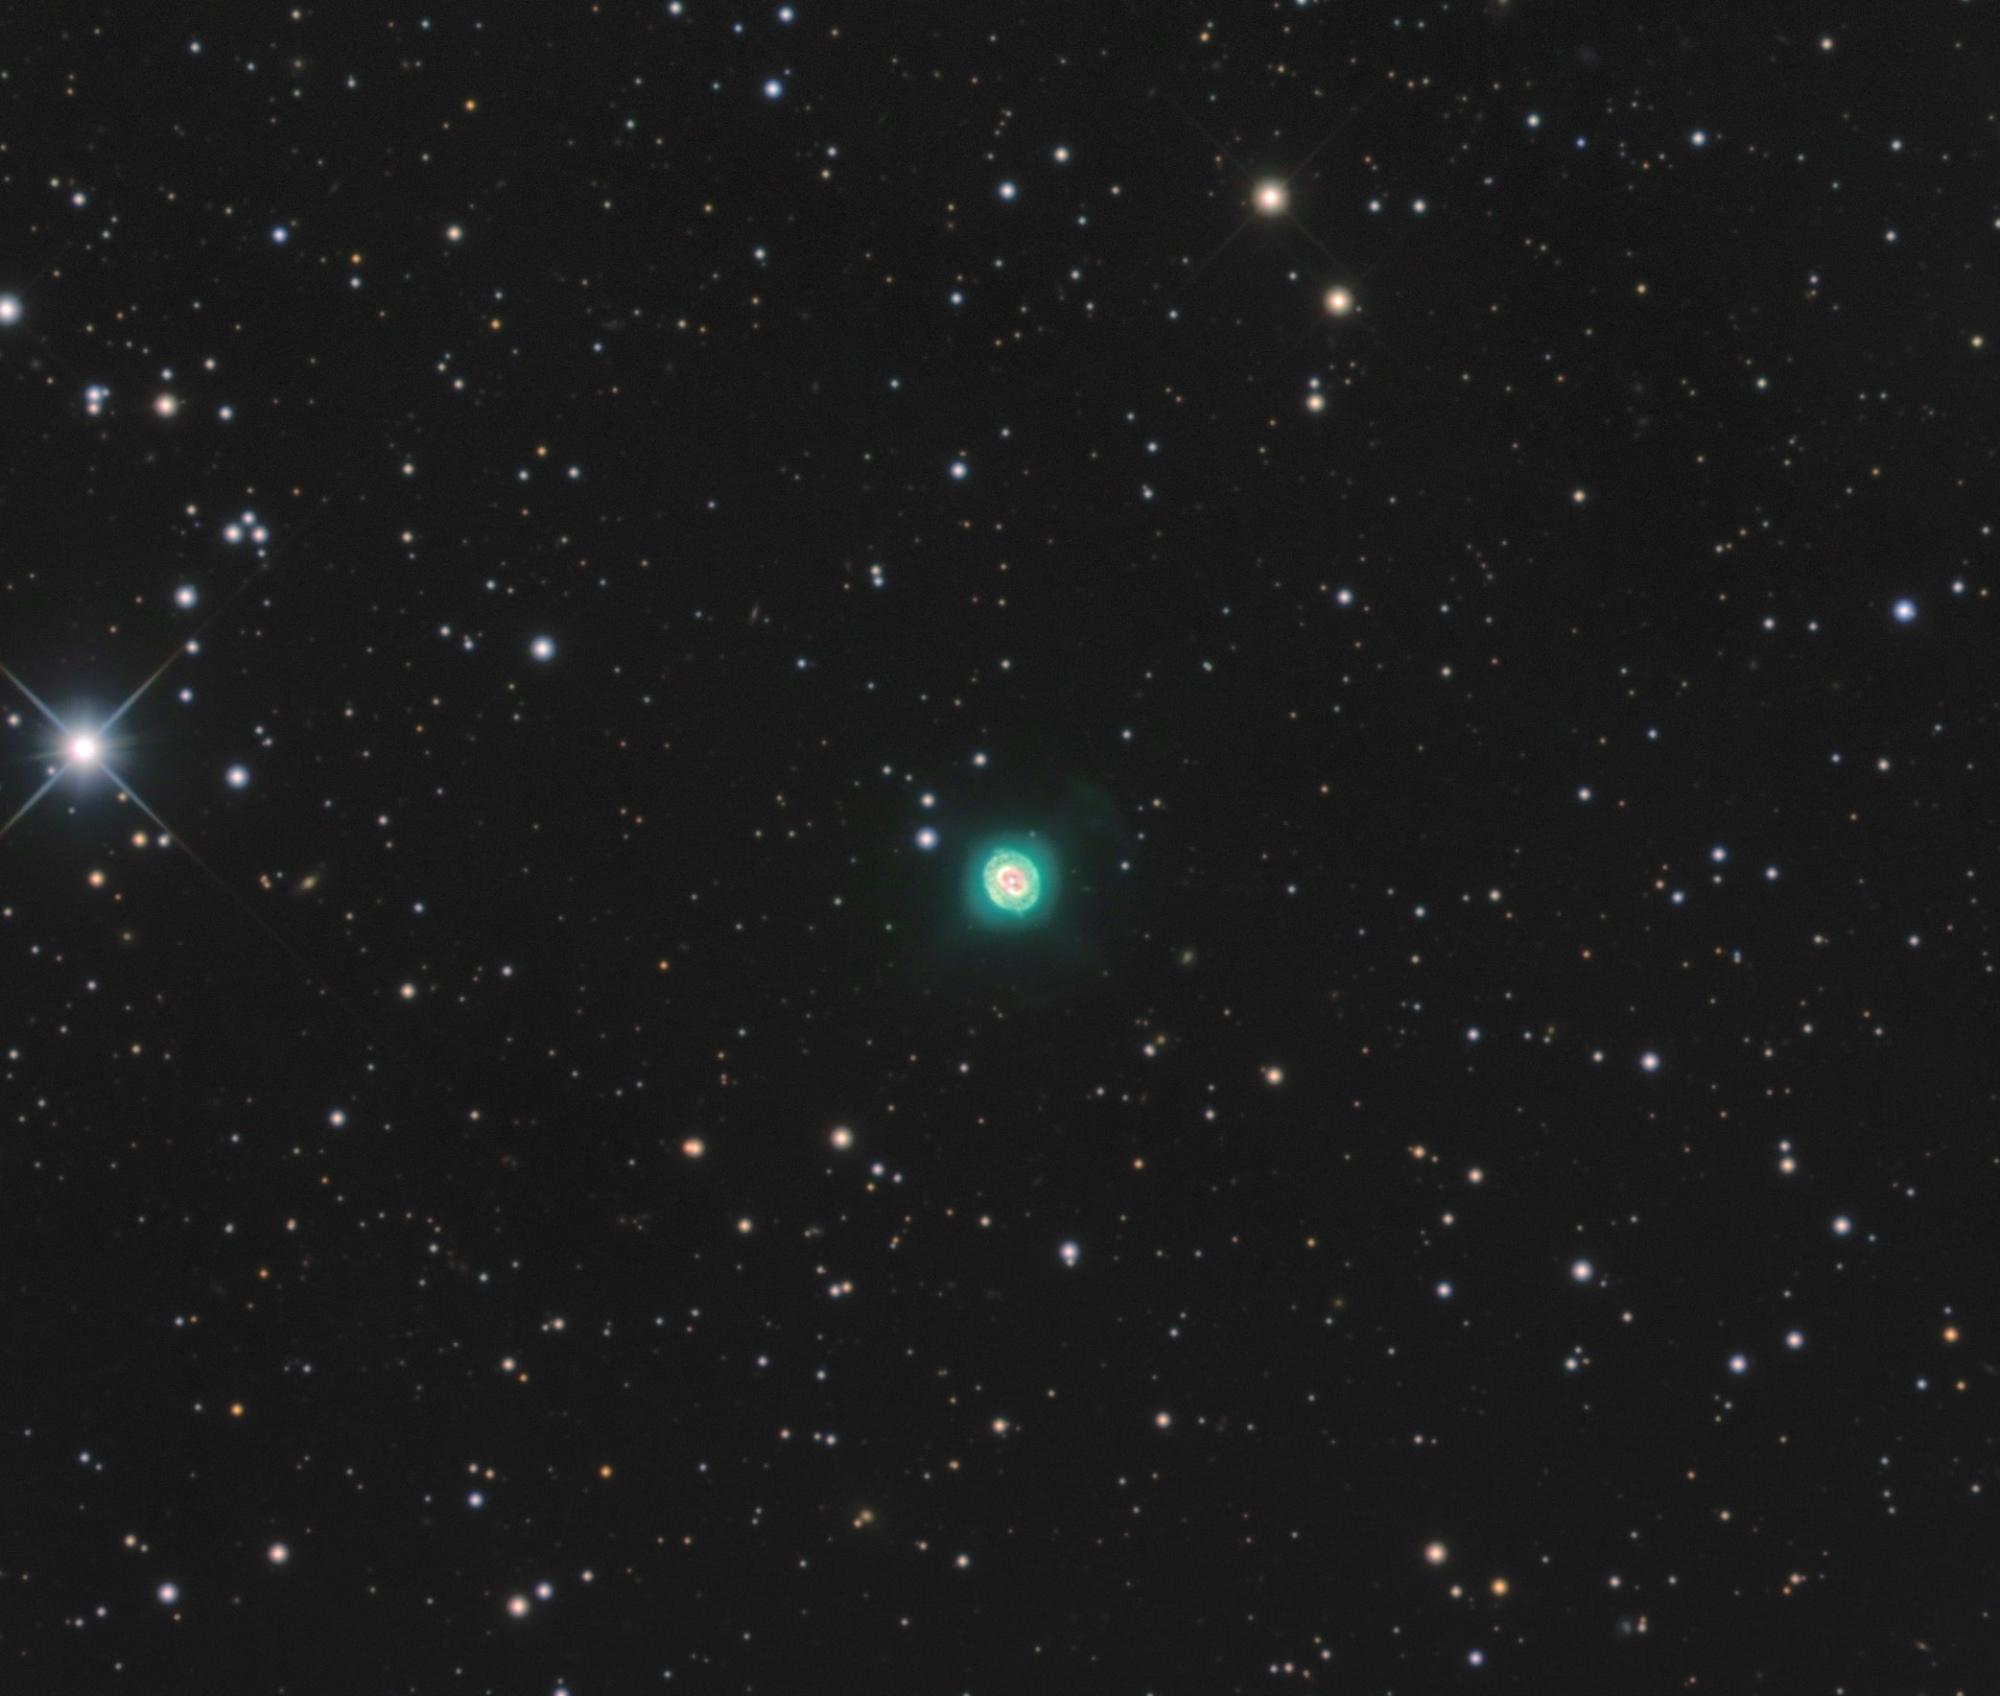 NGC7662-LRVB-V1-Publi-Crop.thumb.jpg.2041cdf74314228017e19bc063c72e0a.jpg